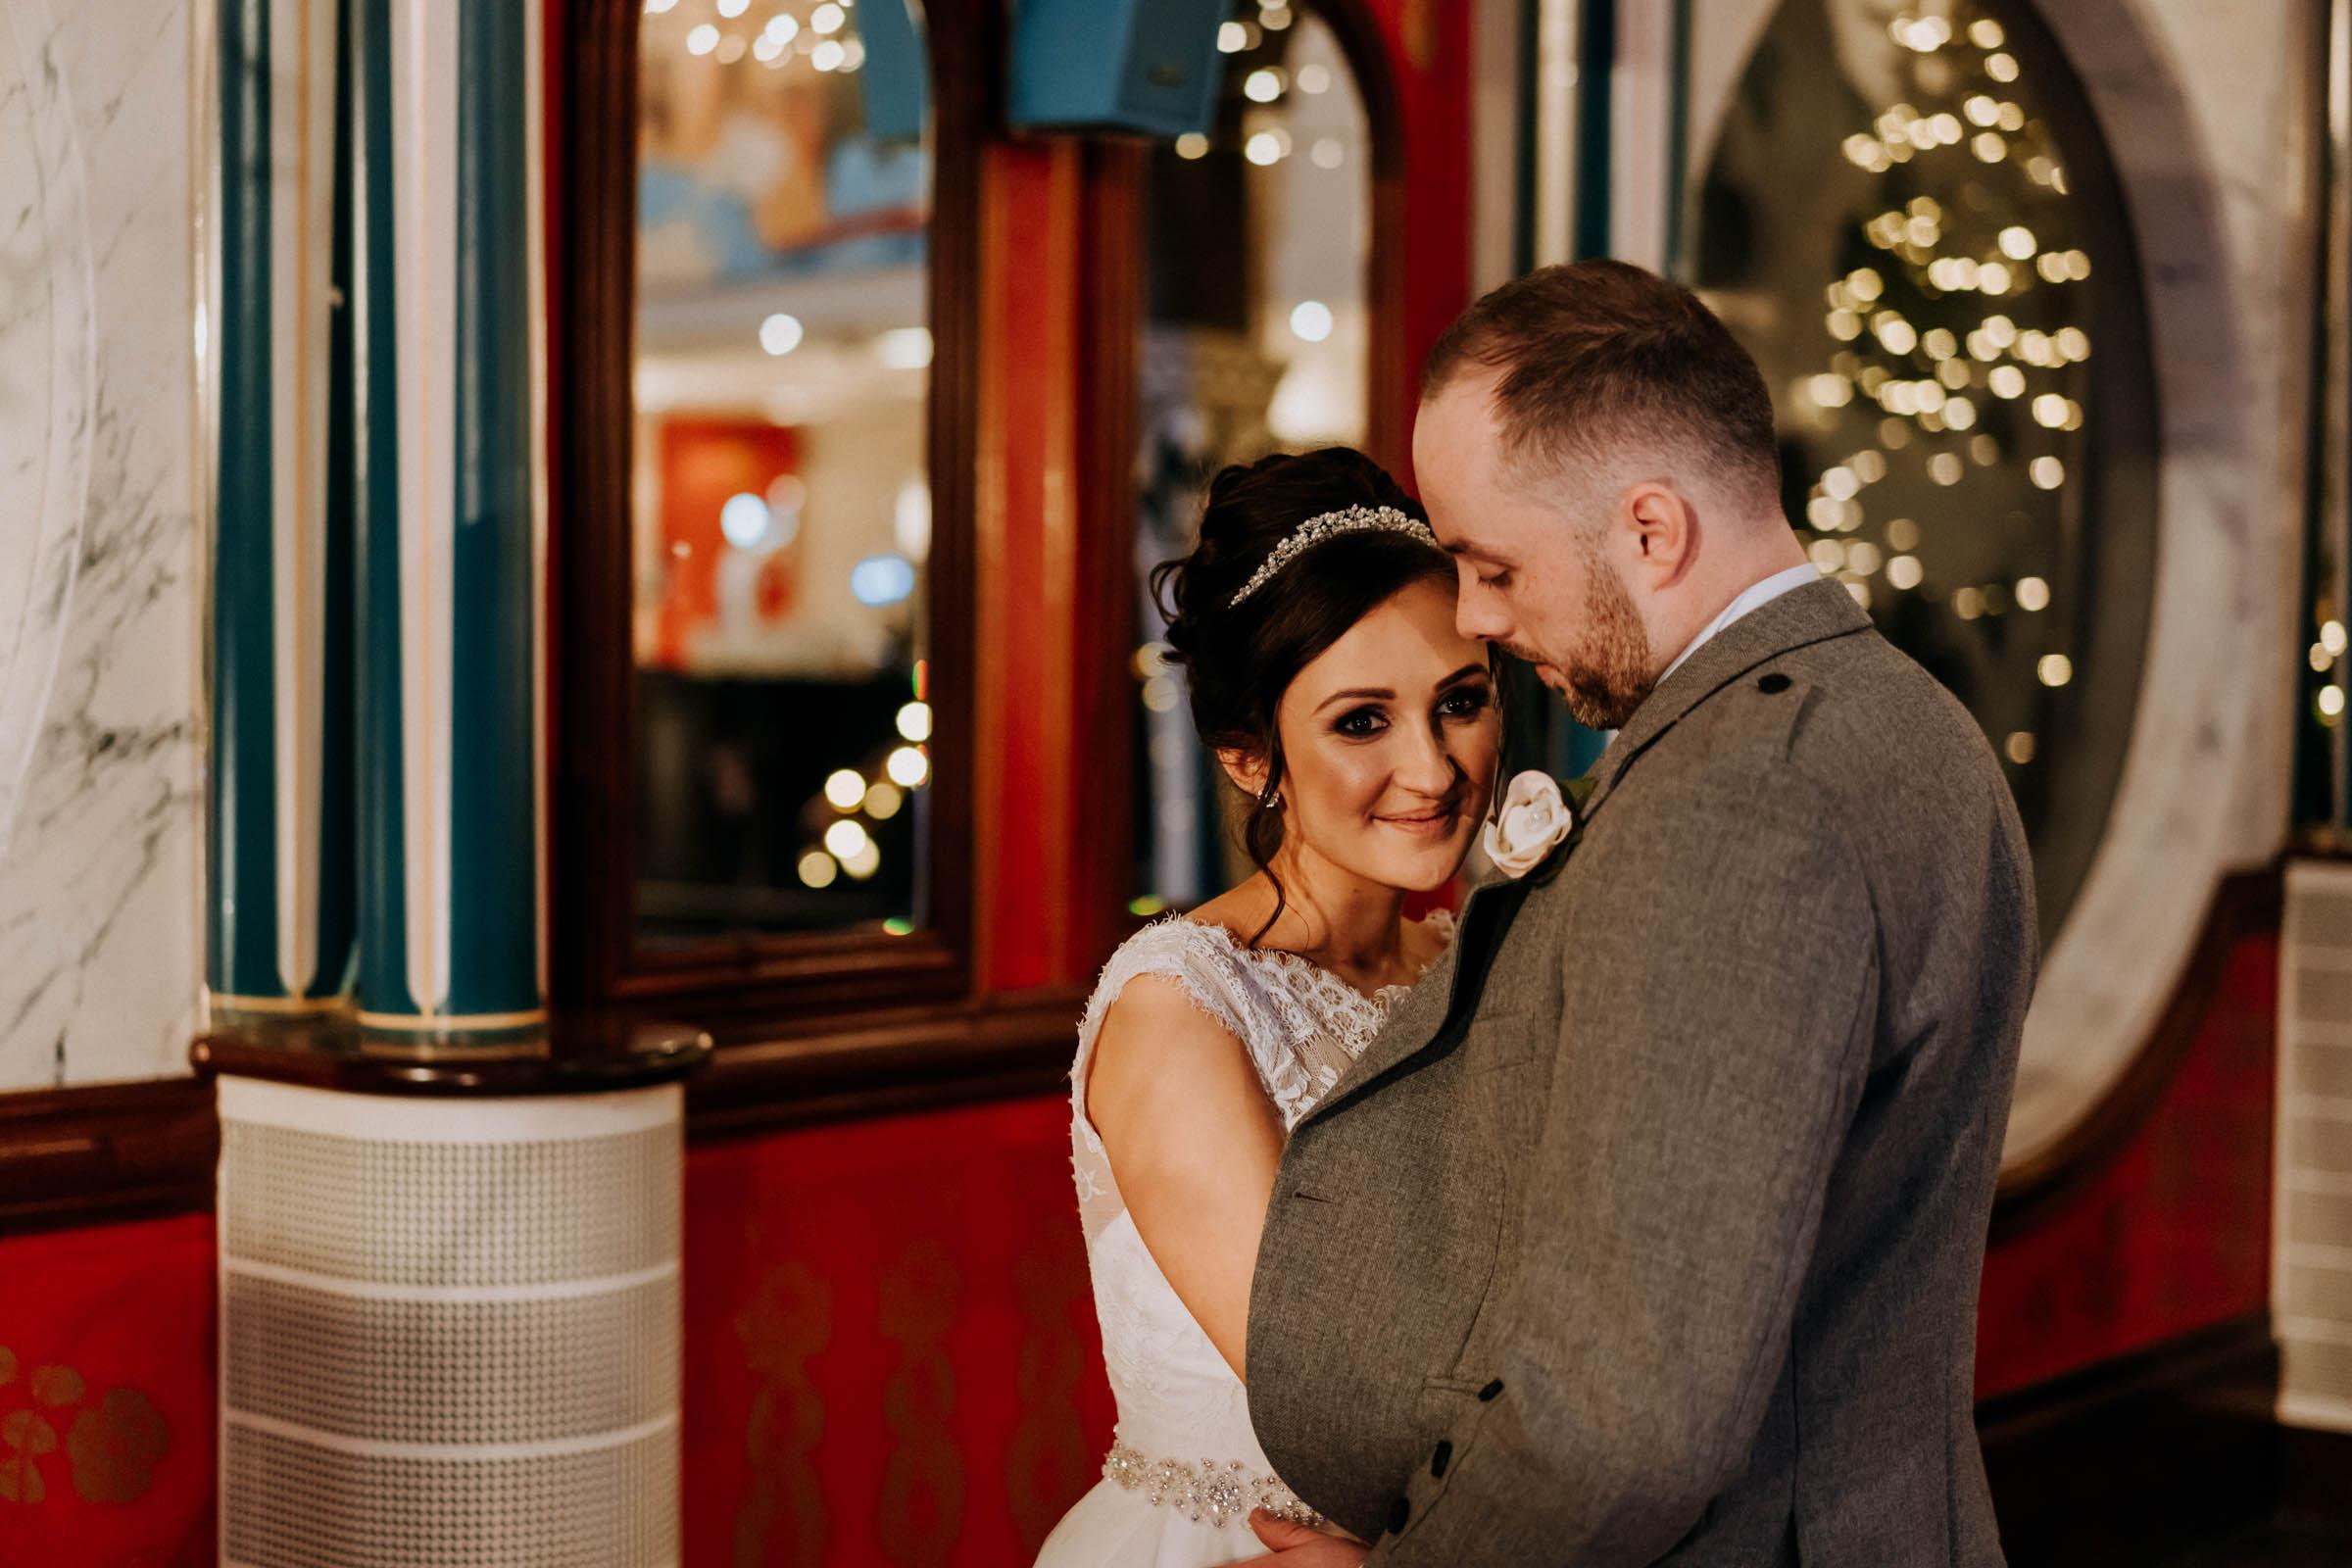 Oran-Mor-Wedding-Photographer-DearlyPhotography (53 of 55).jpg